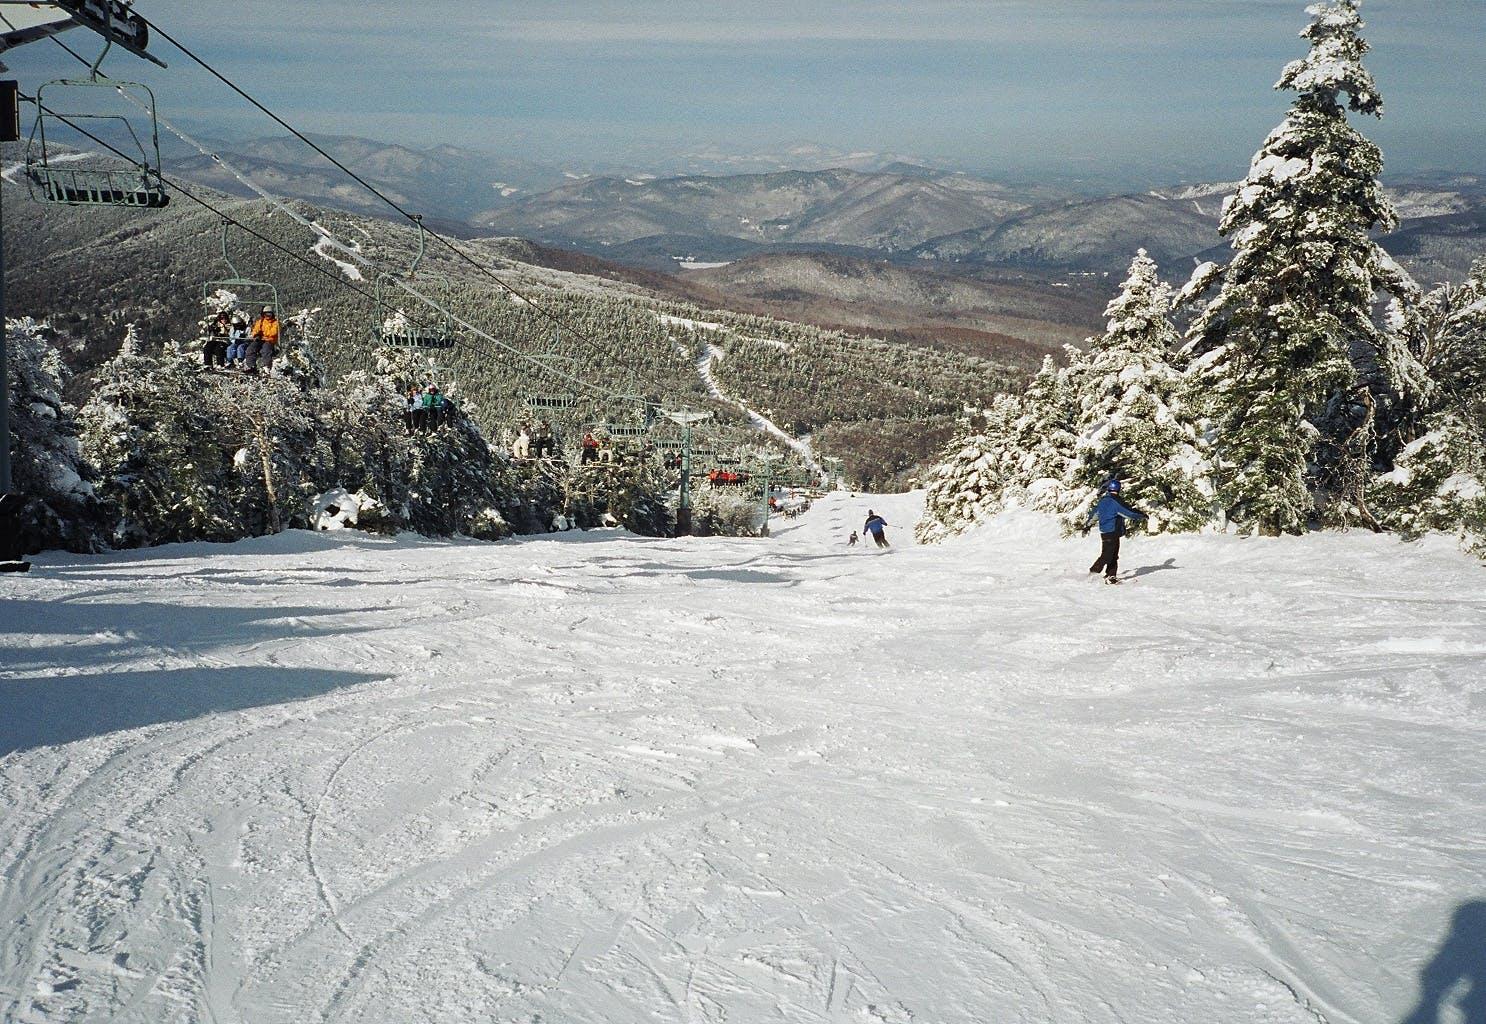 skiers going down a run at North Ridge of Killington Resort